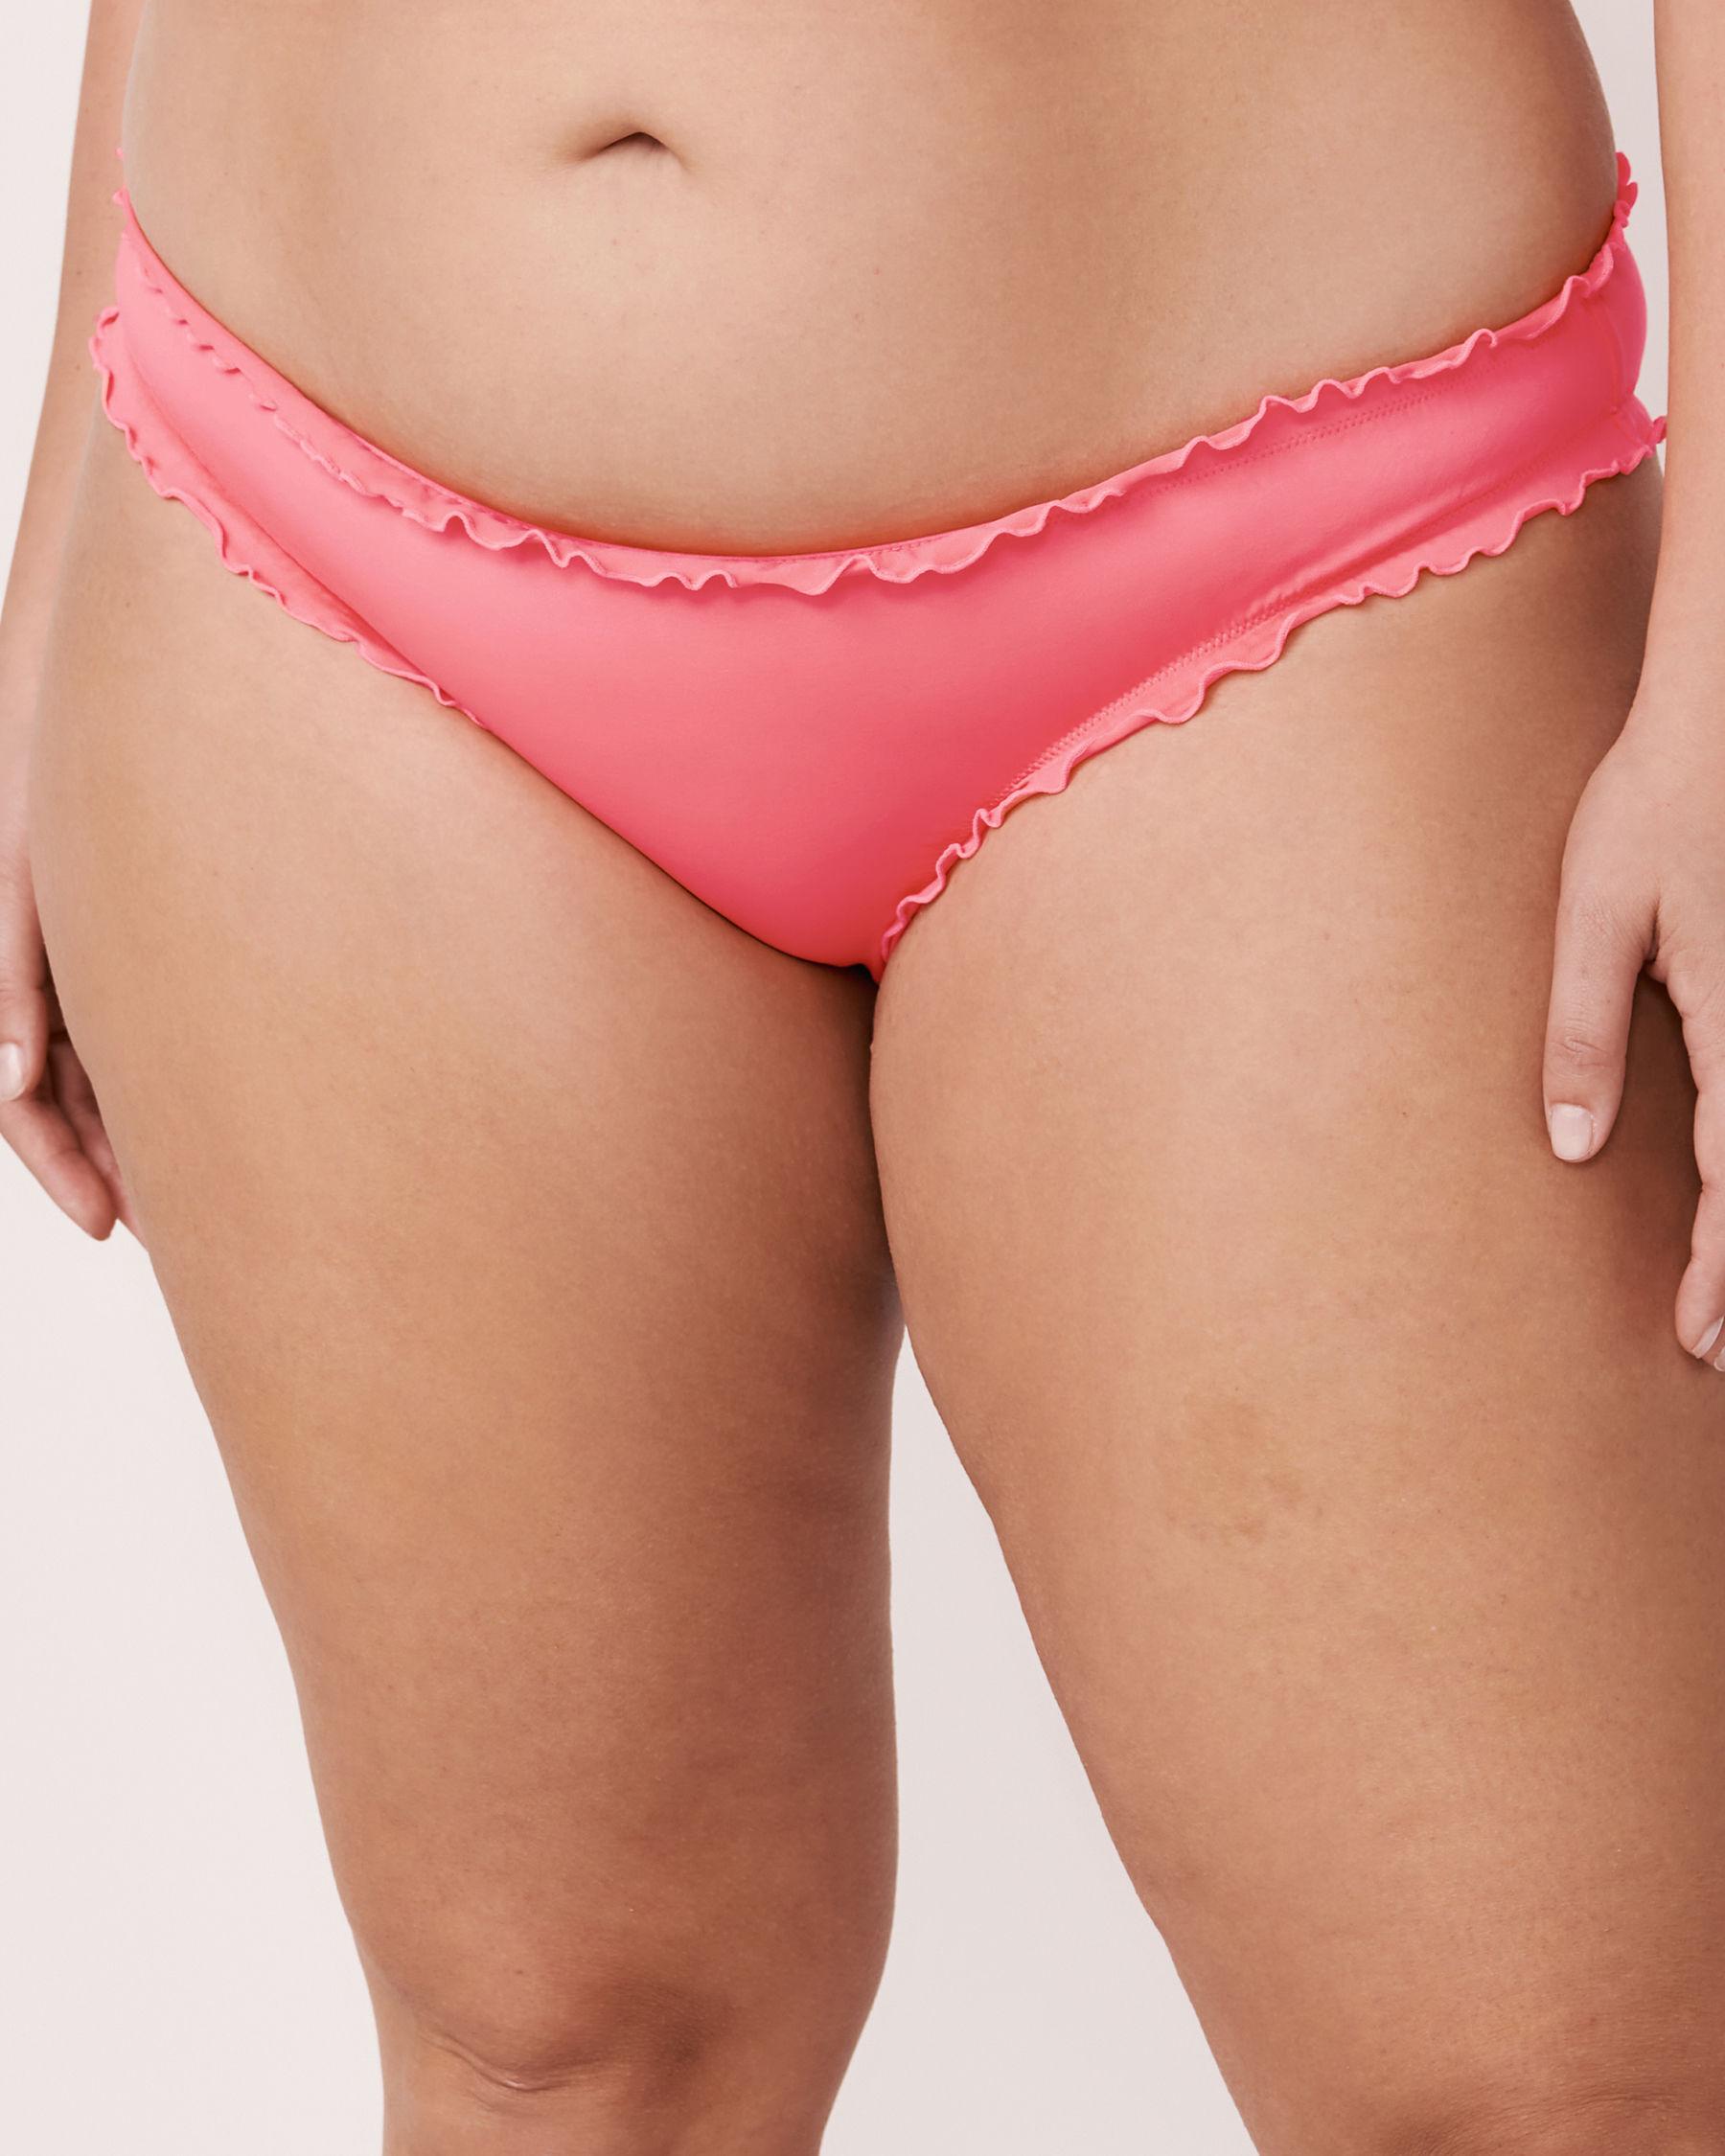 LA VIE EN ROSE AQUA MELON Ruffle Bikini Bottom Pink 70300035 - View1